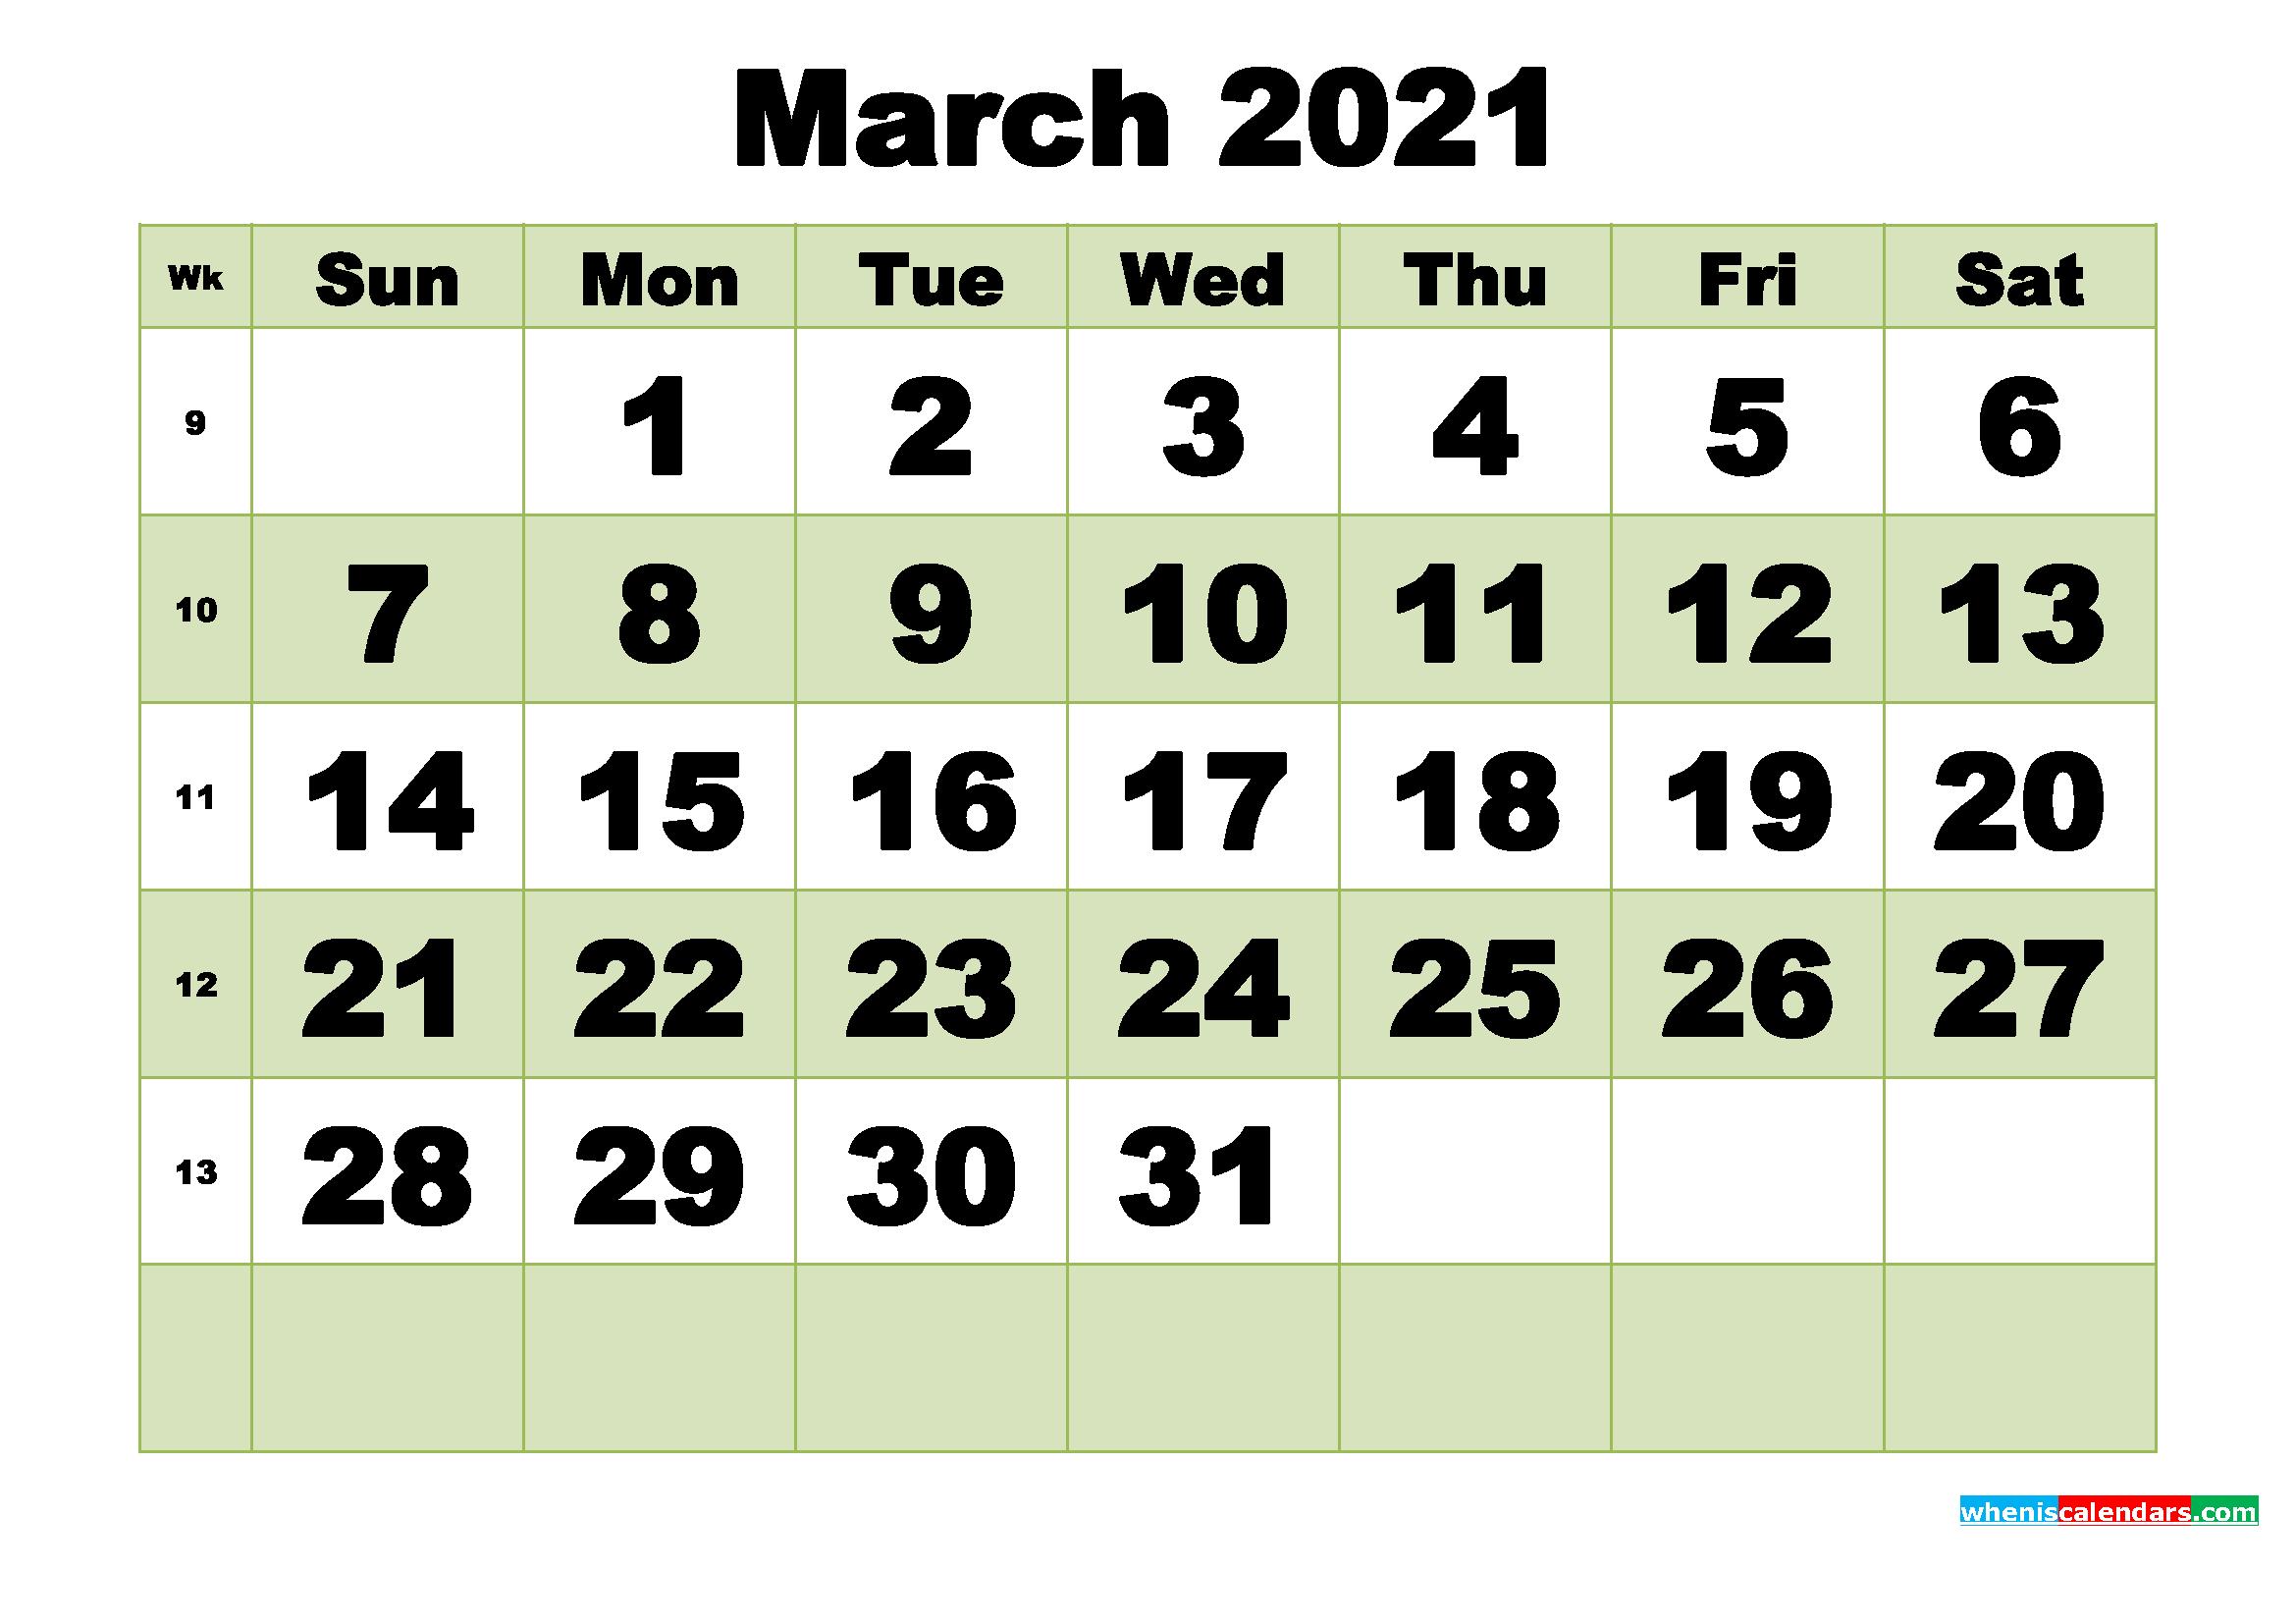 March 2021 Printable Calendar Template - Free Printable ...